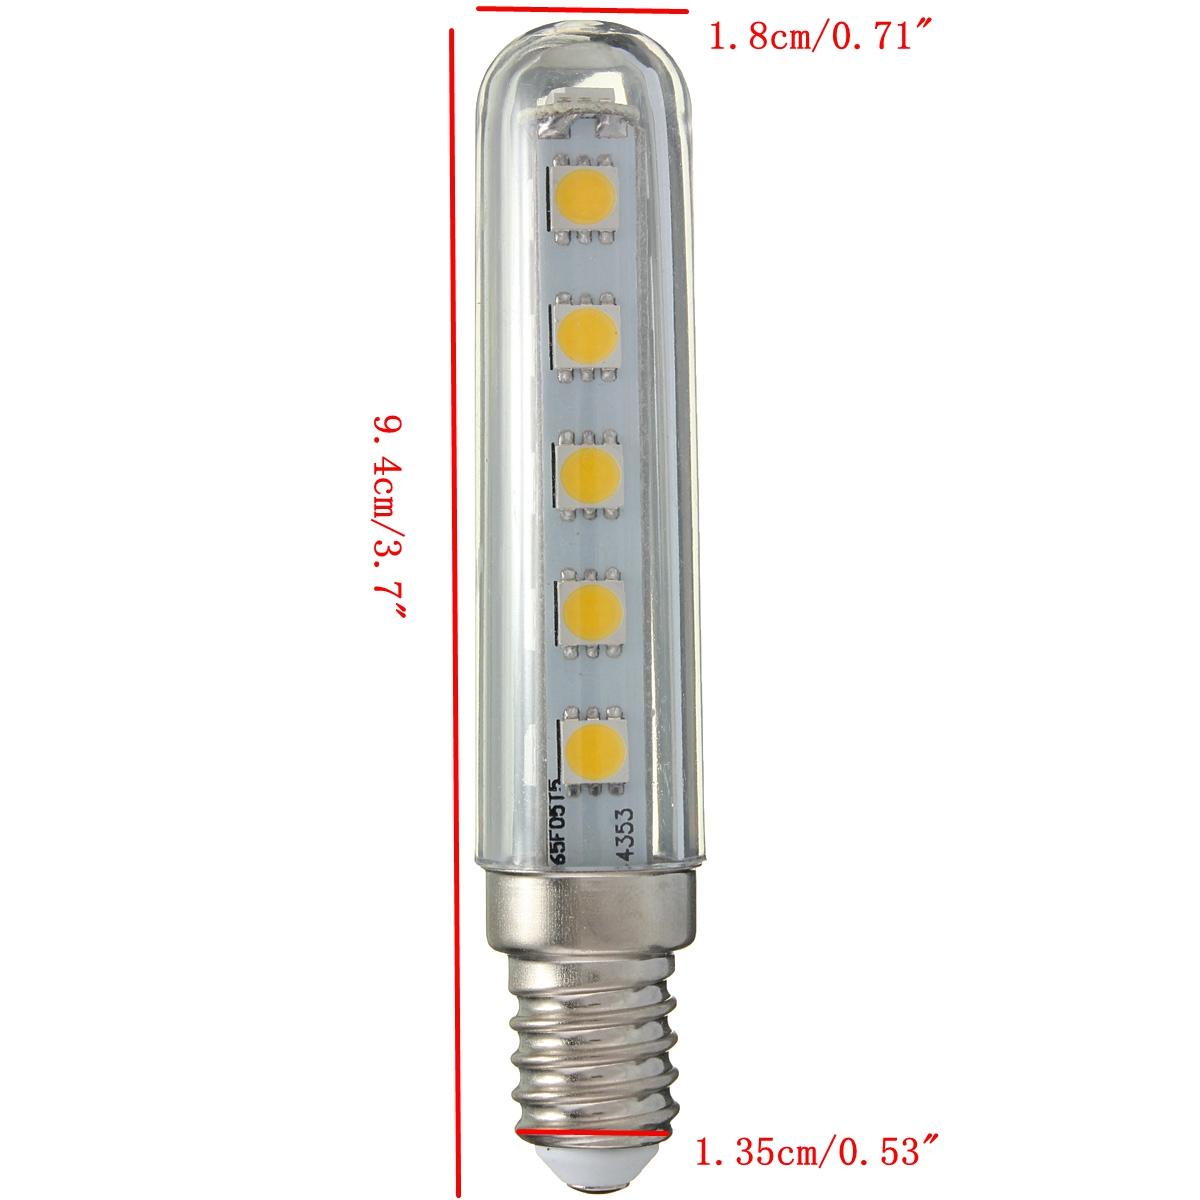 2X E14 2.5W SMD5050 16LEDs Warm White Light Bulb for Kitchen Refrigerator Gallery AC220V